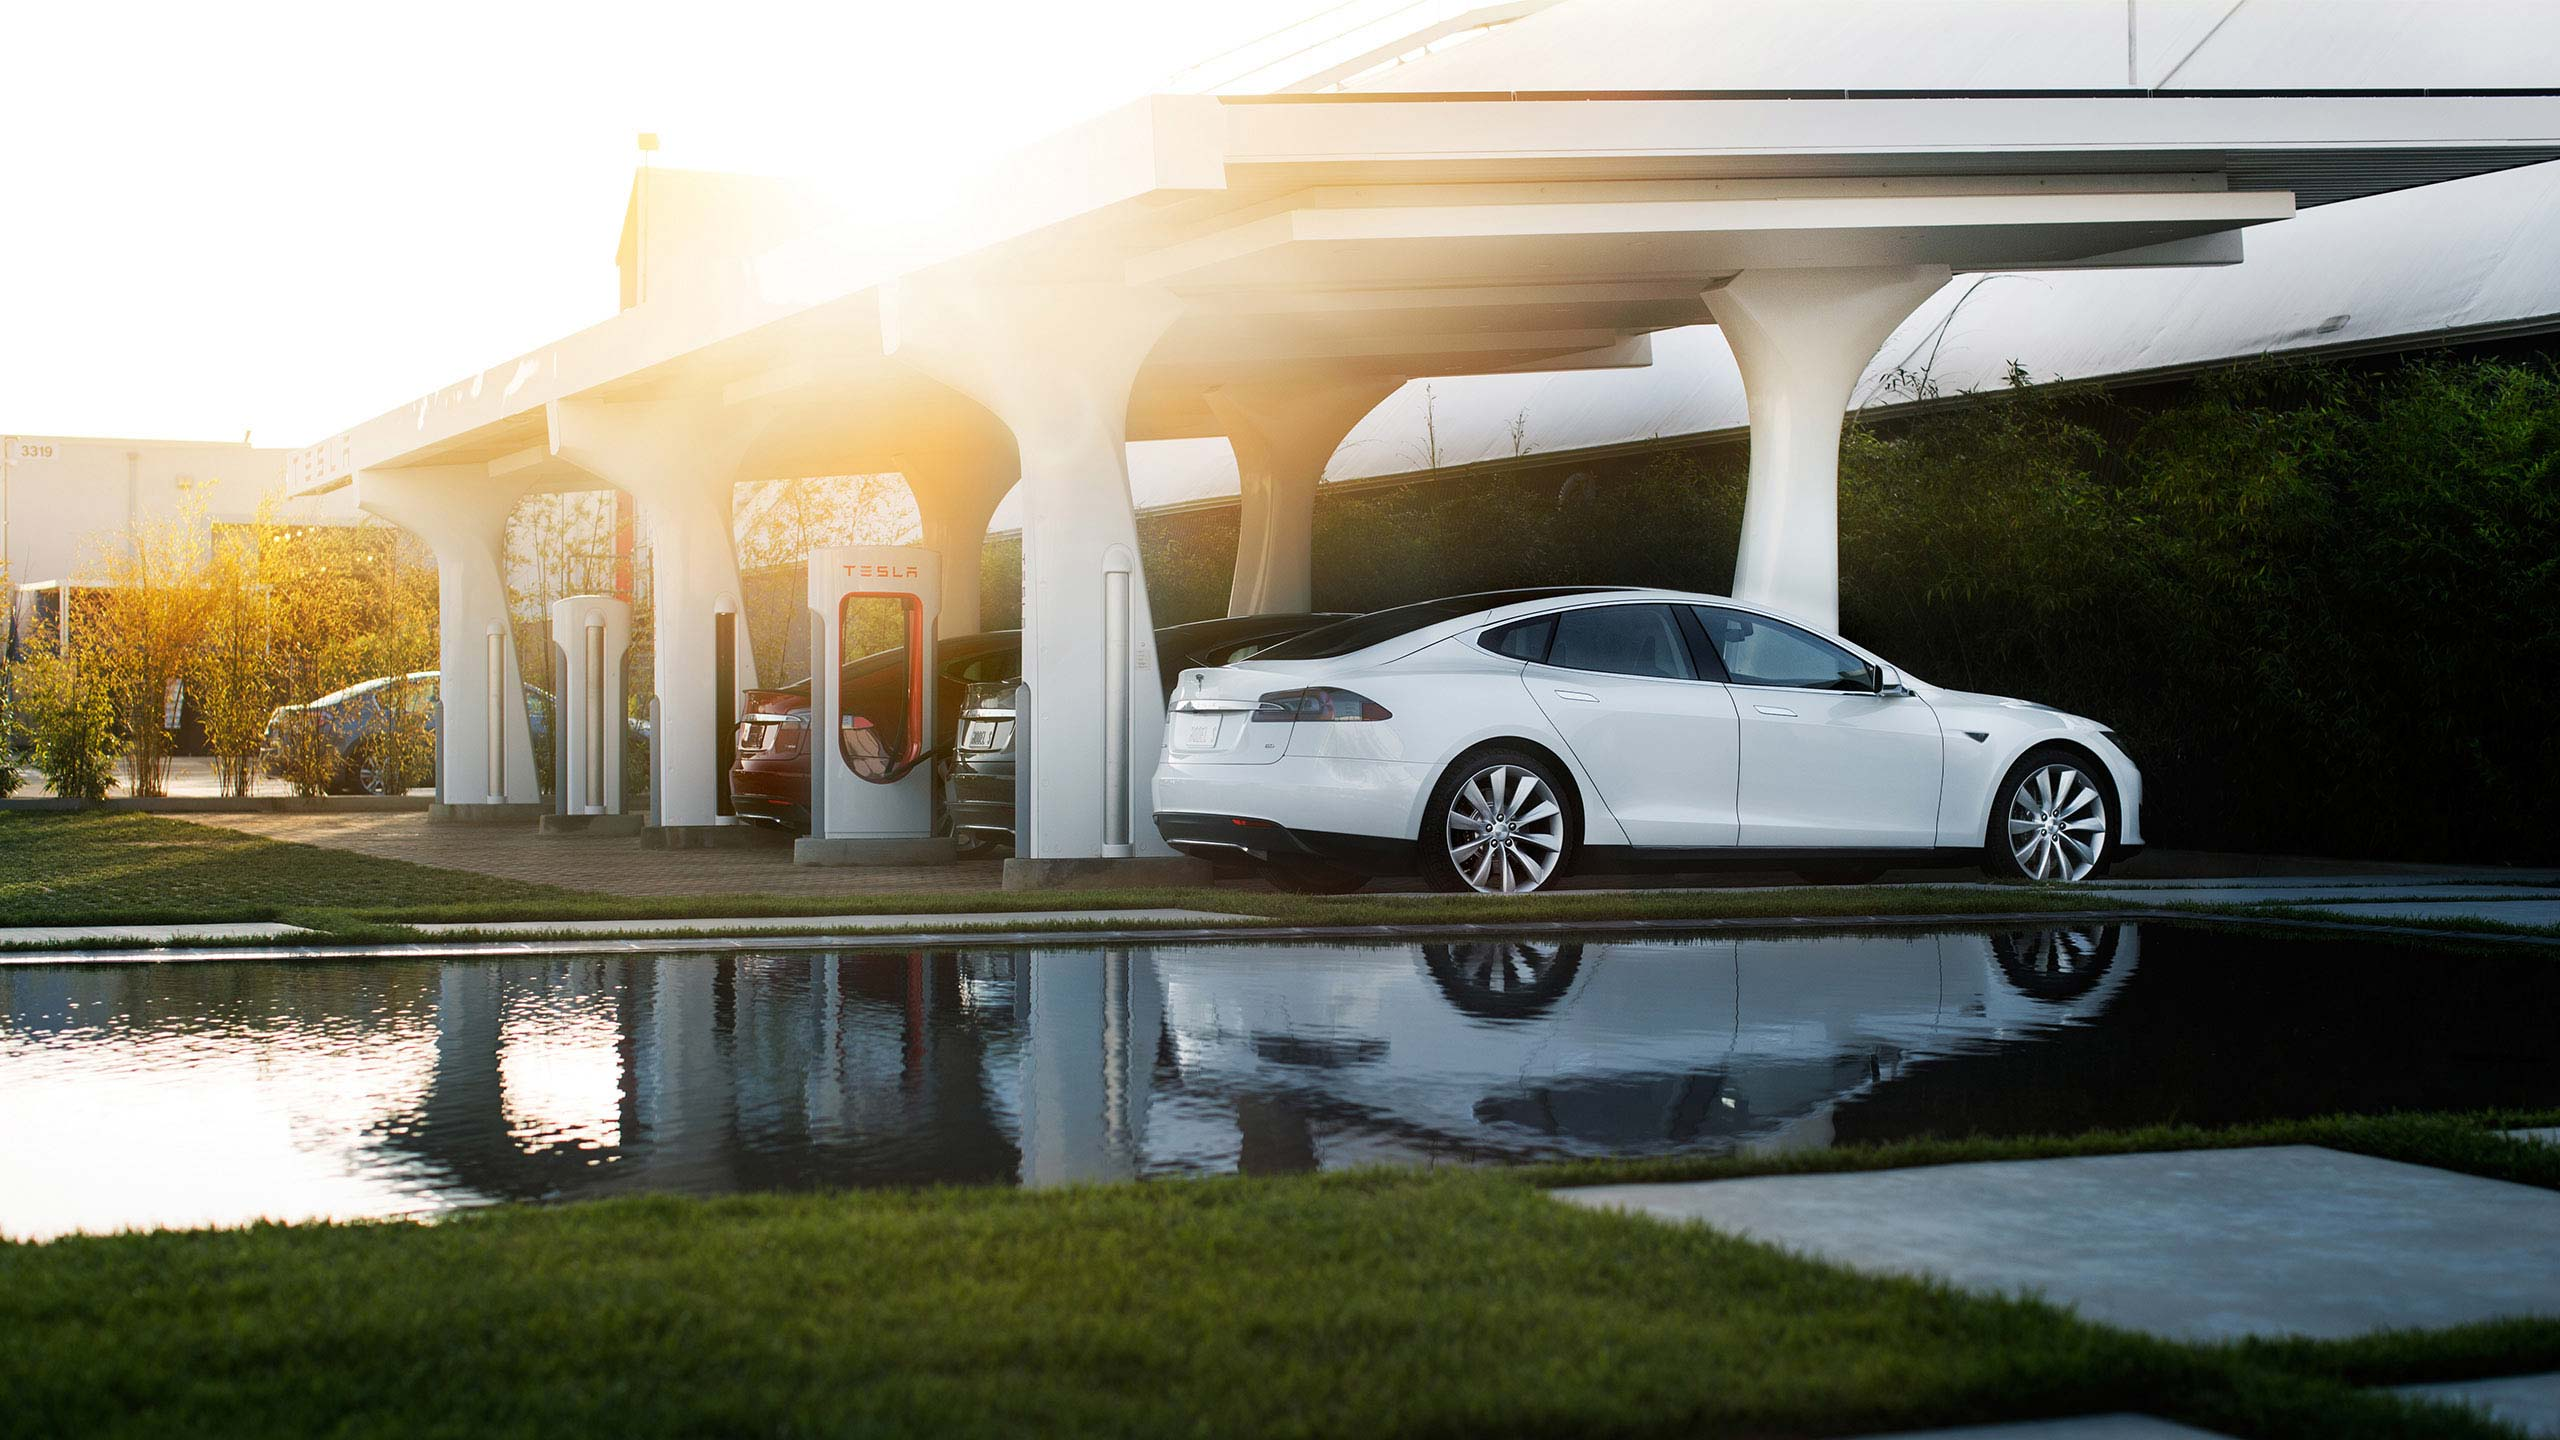 Tesla-Design-Center-Hawthorne-Pond